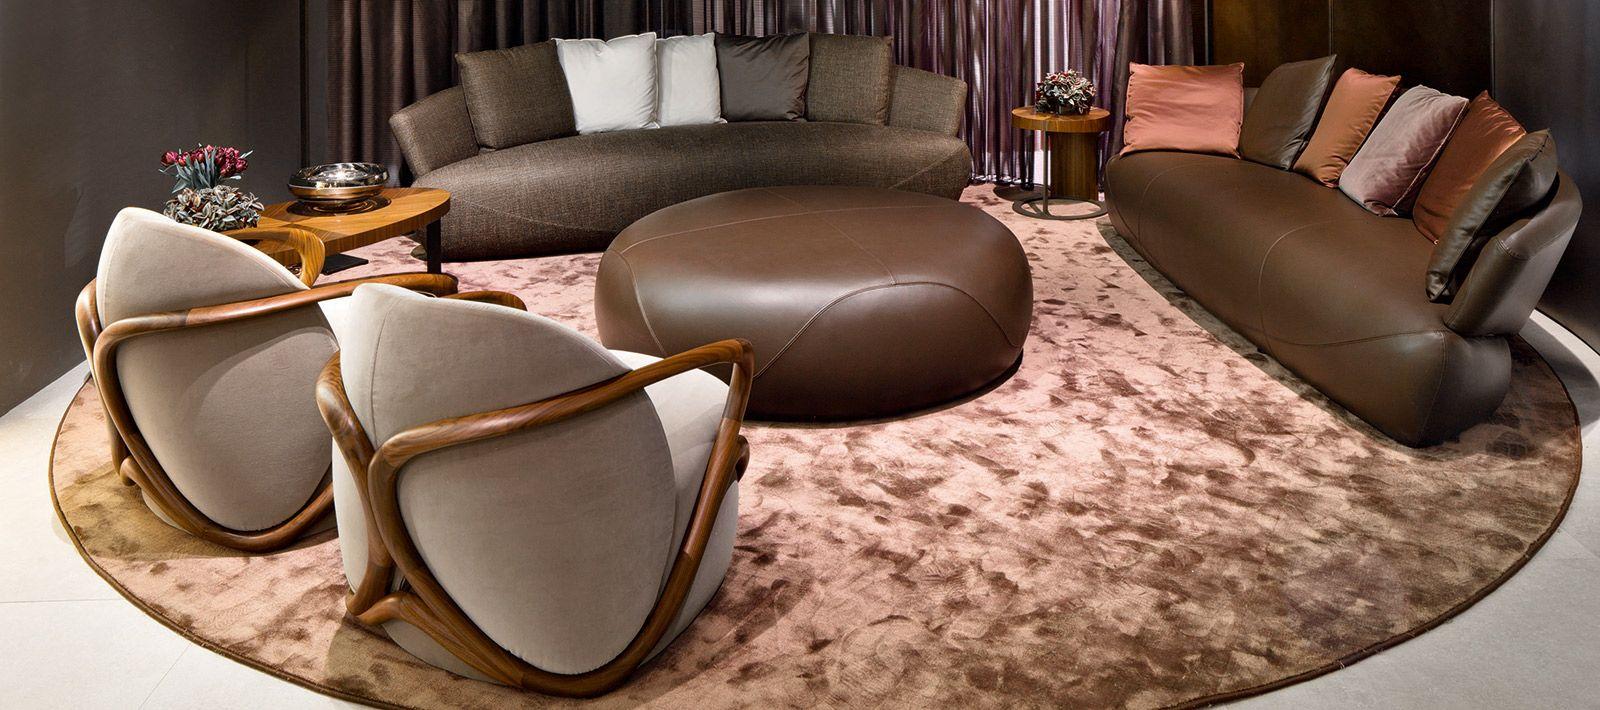 Hug Round sofa, Italian chair, Round sofa chair